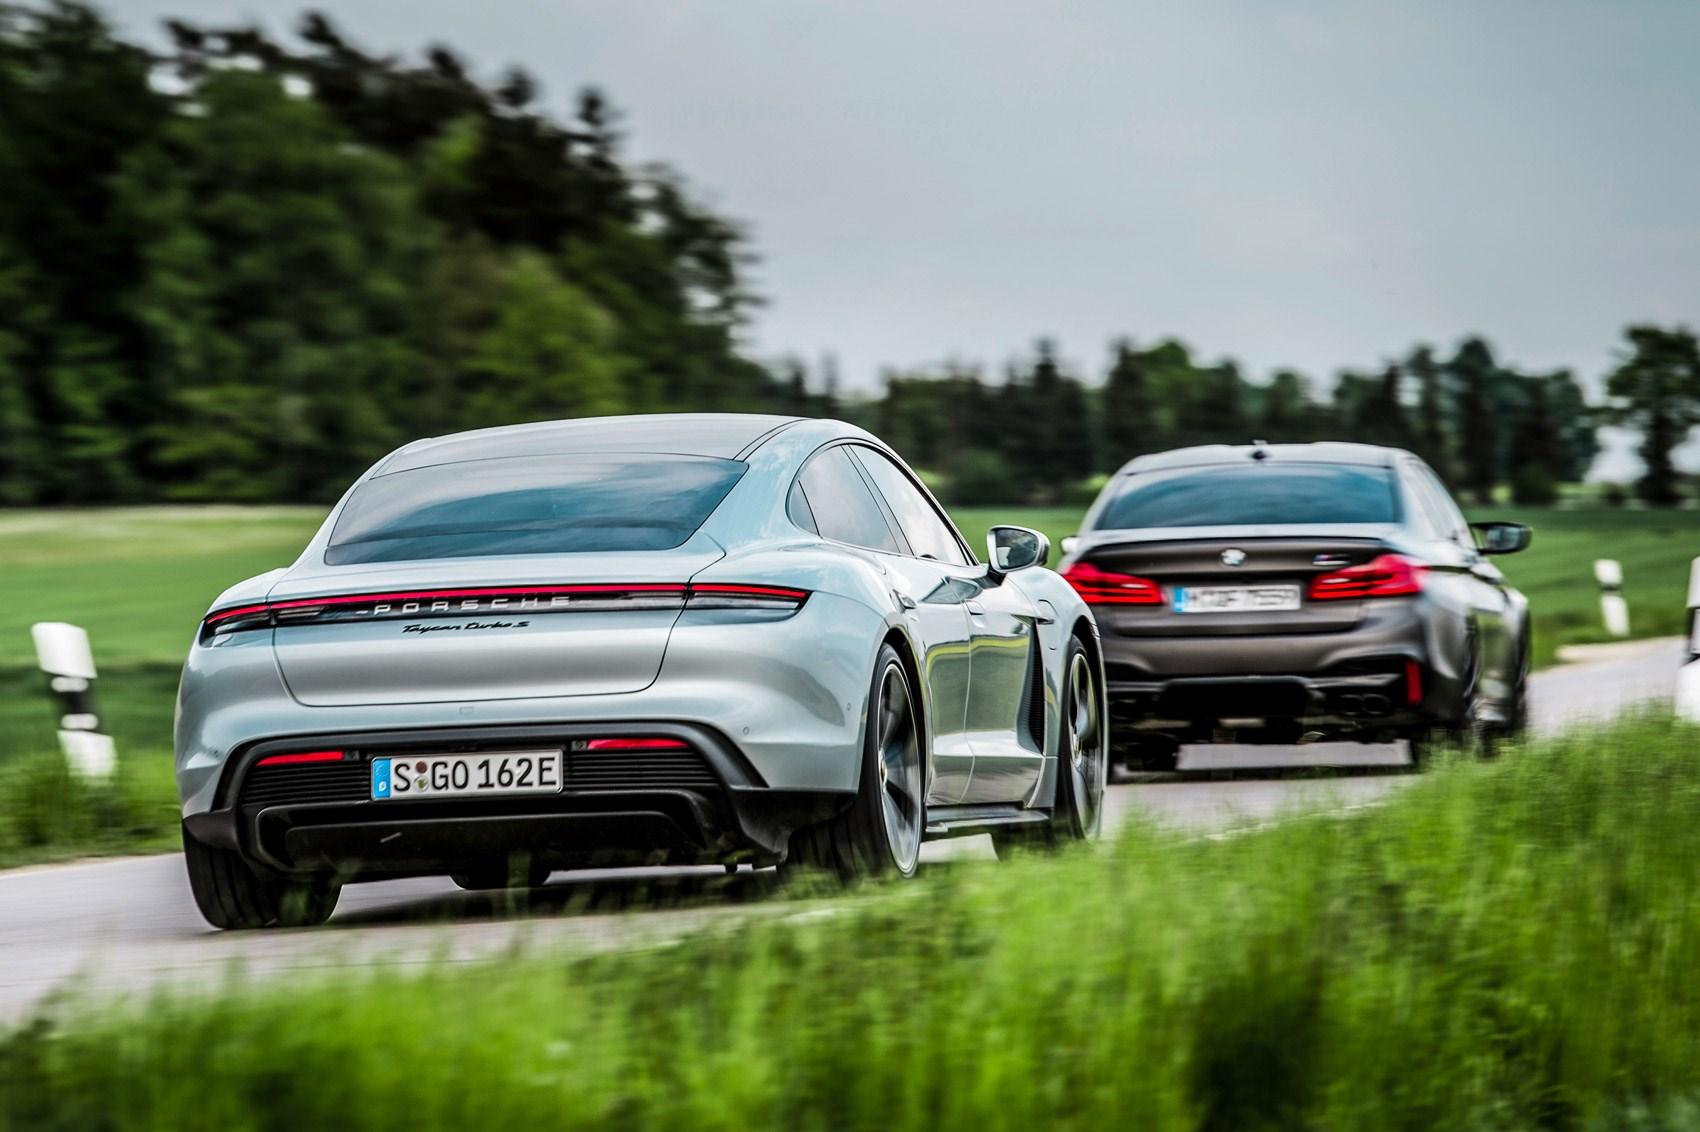 Porsche Taycan Vs Tesla Model S Vs Bmw M5 Vs Polestar 1 Group Test 2020 Review Car Magazine